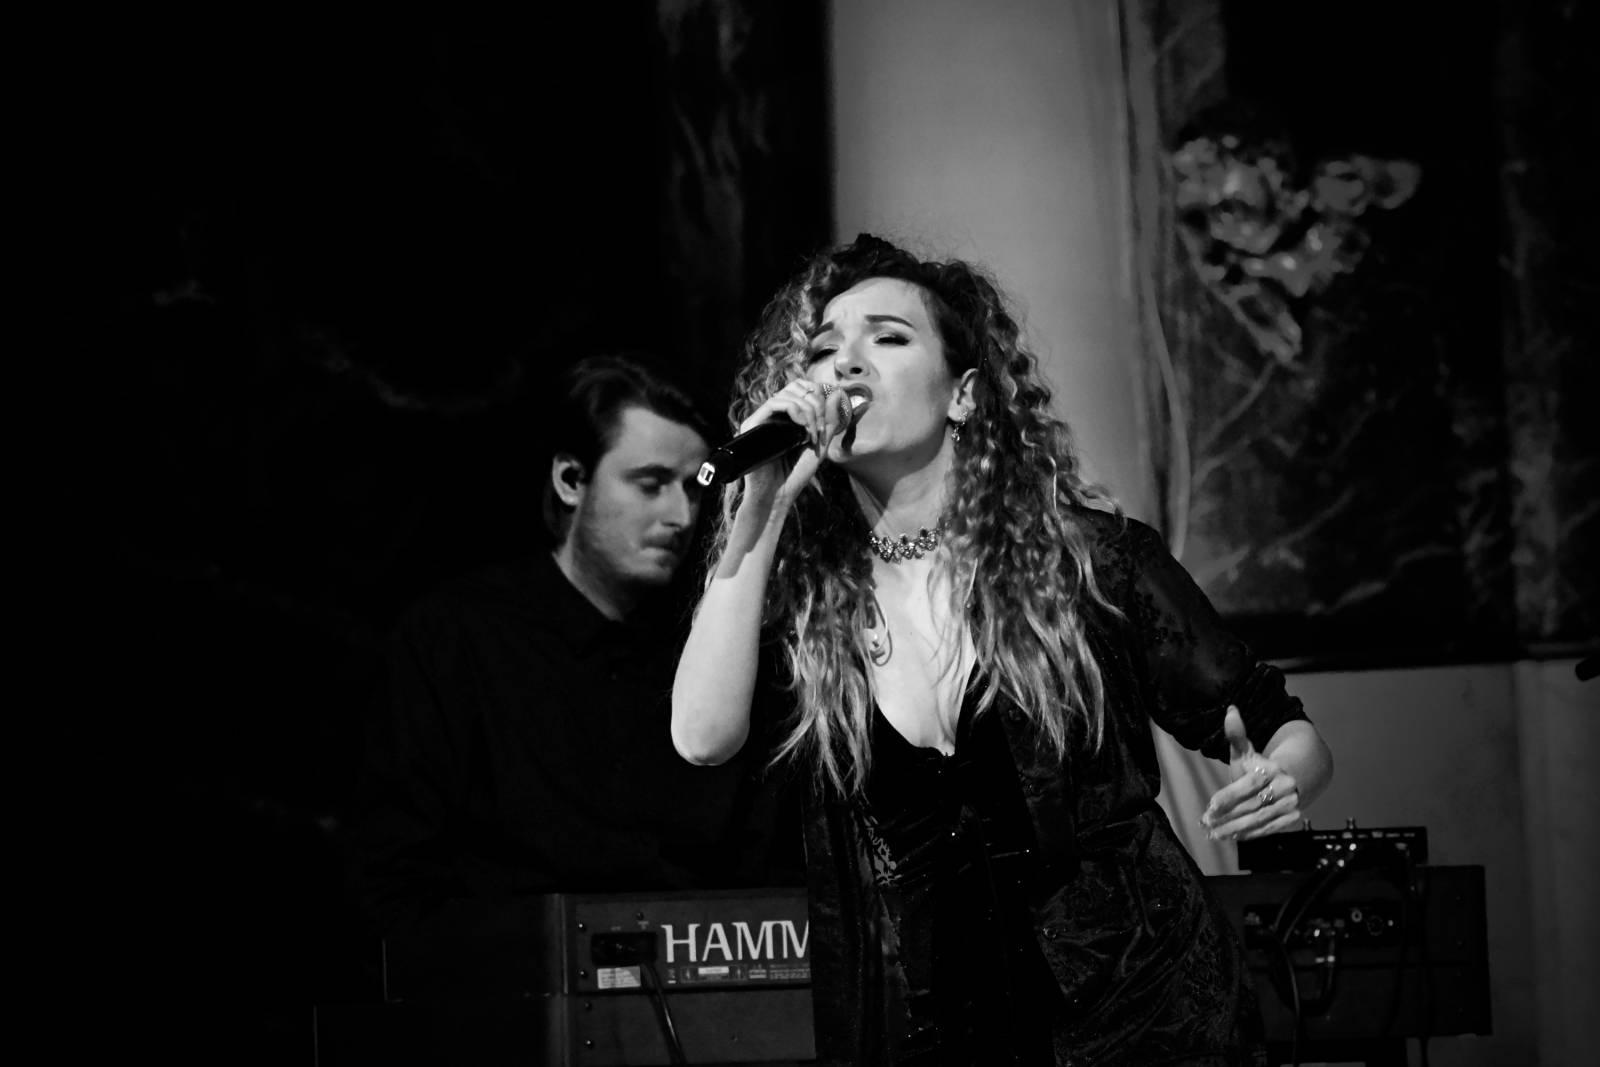 Dunja artiest zangeres livemuziek house of events (5)